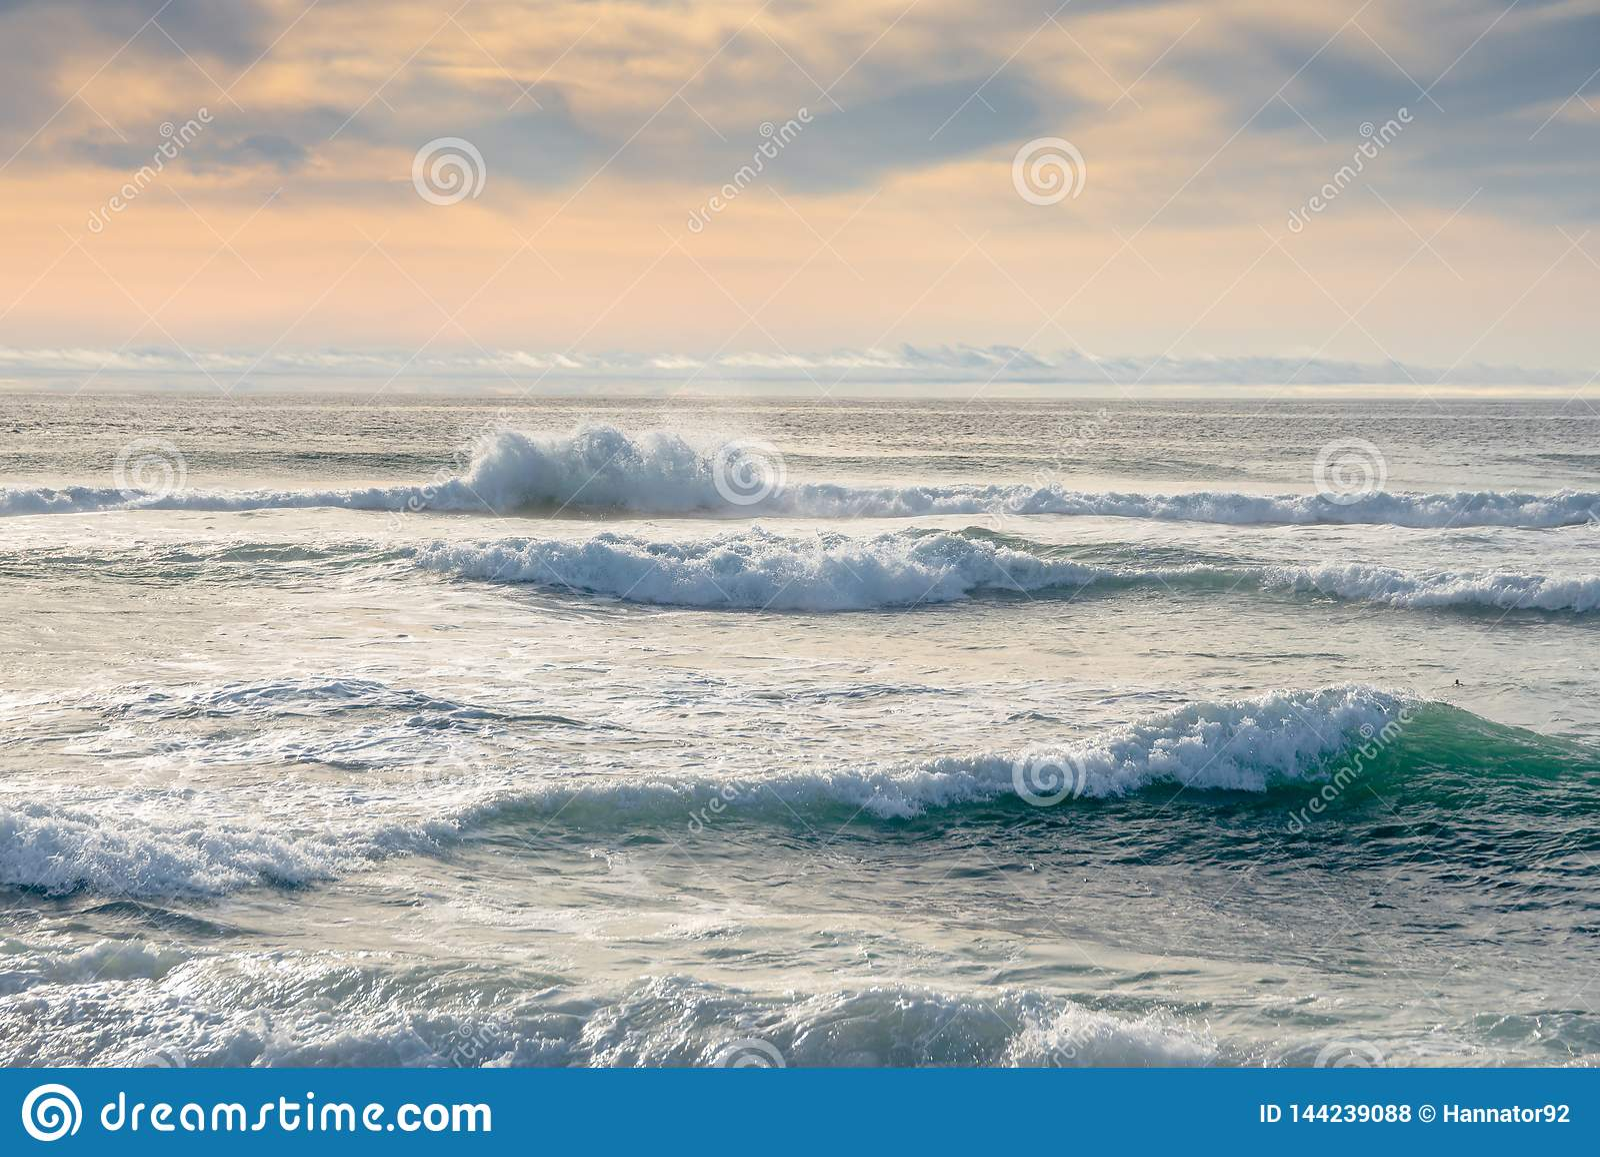 Mar bonito com ondas enormes